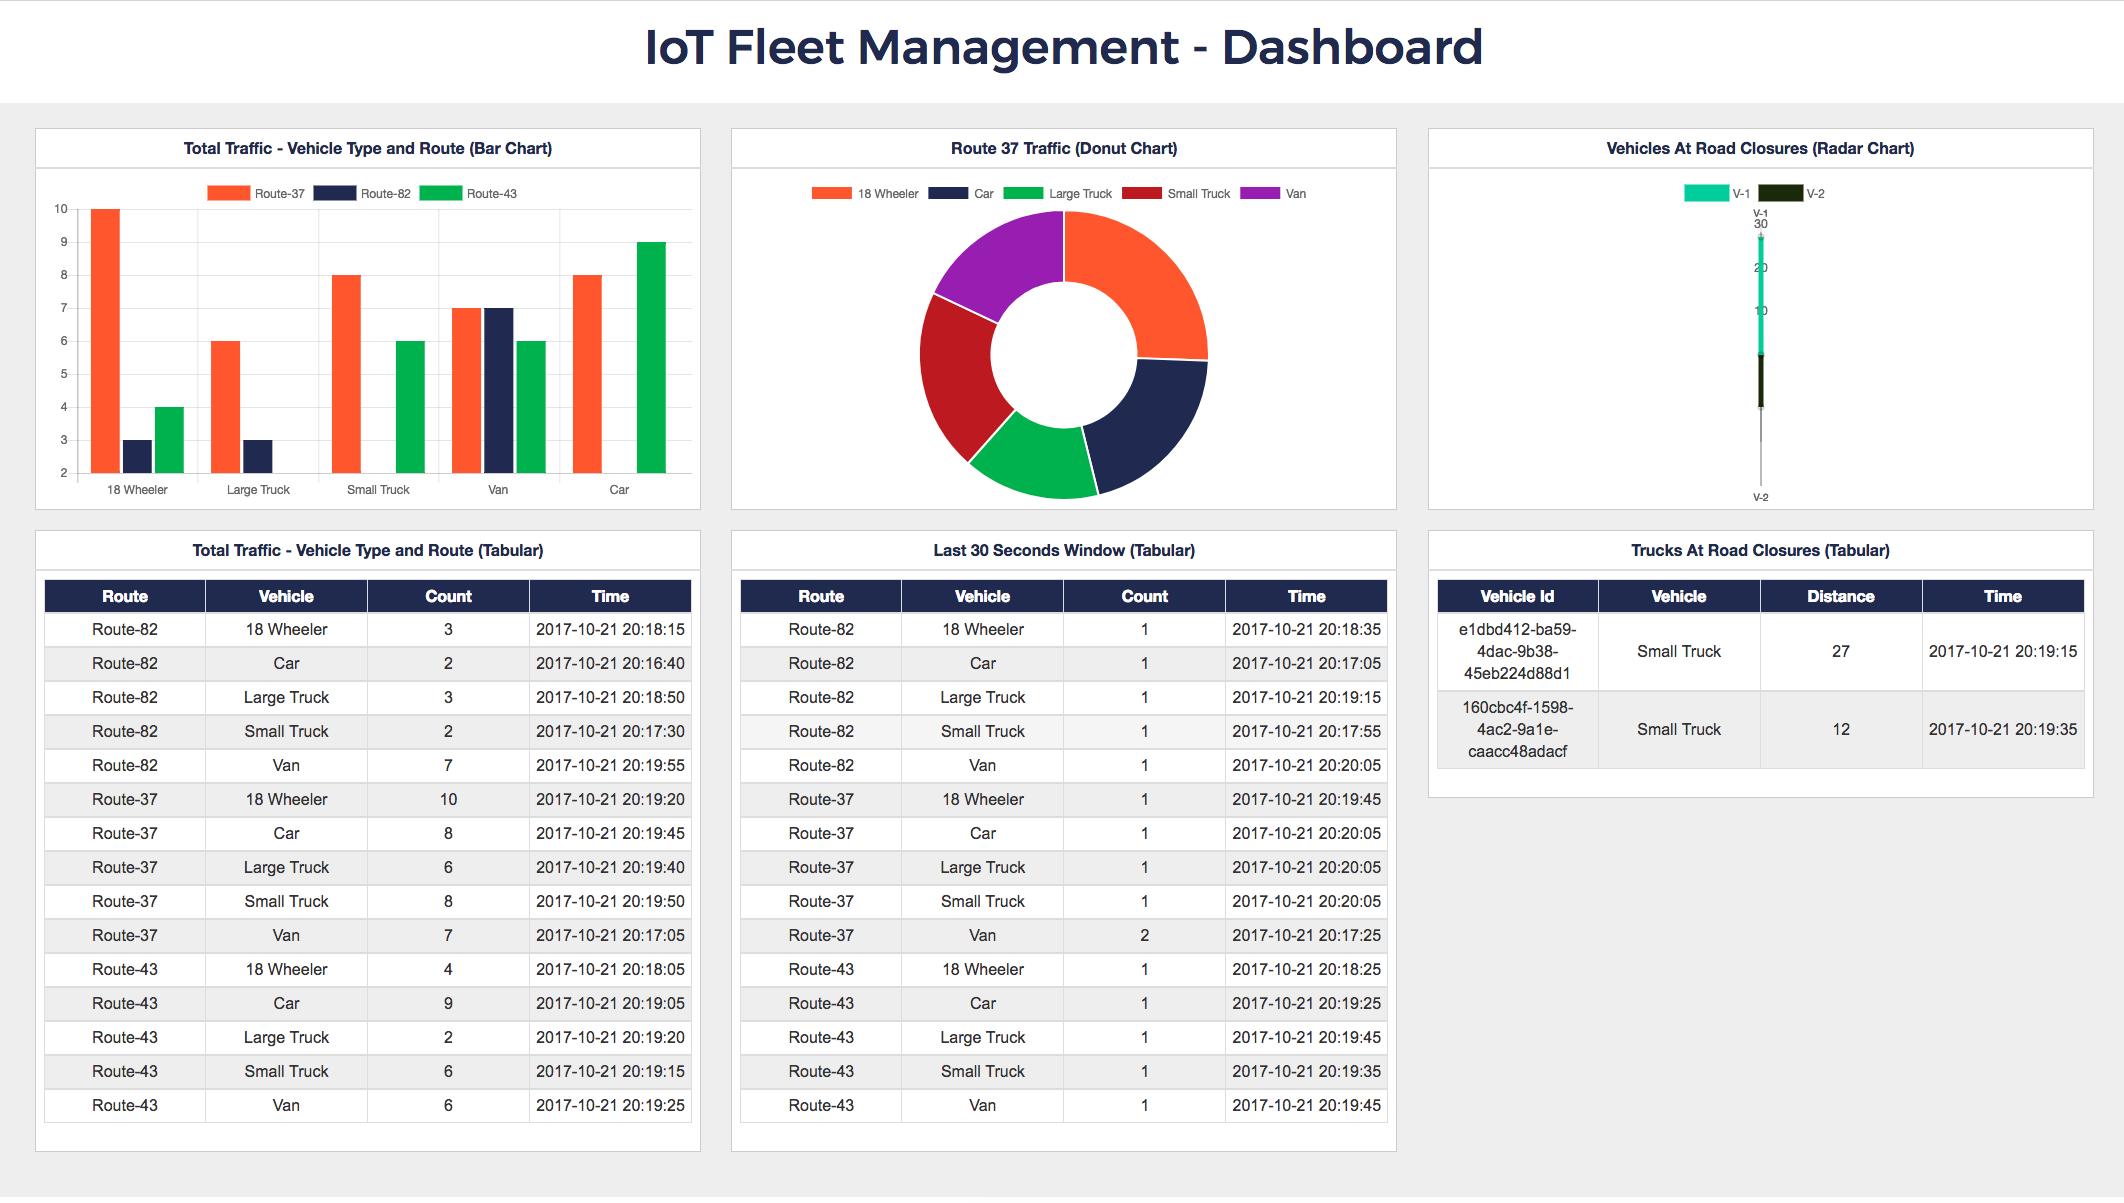 IoT Fleet Management Dashboard